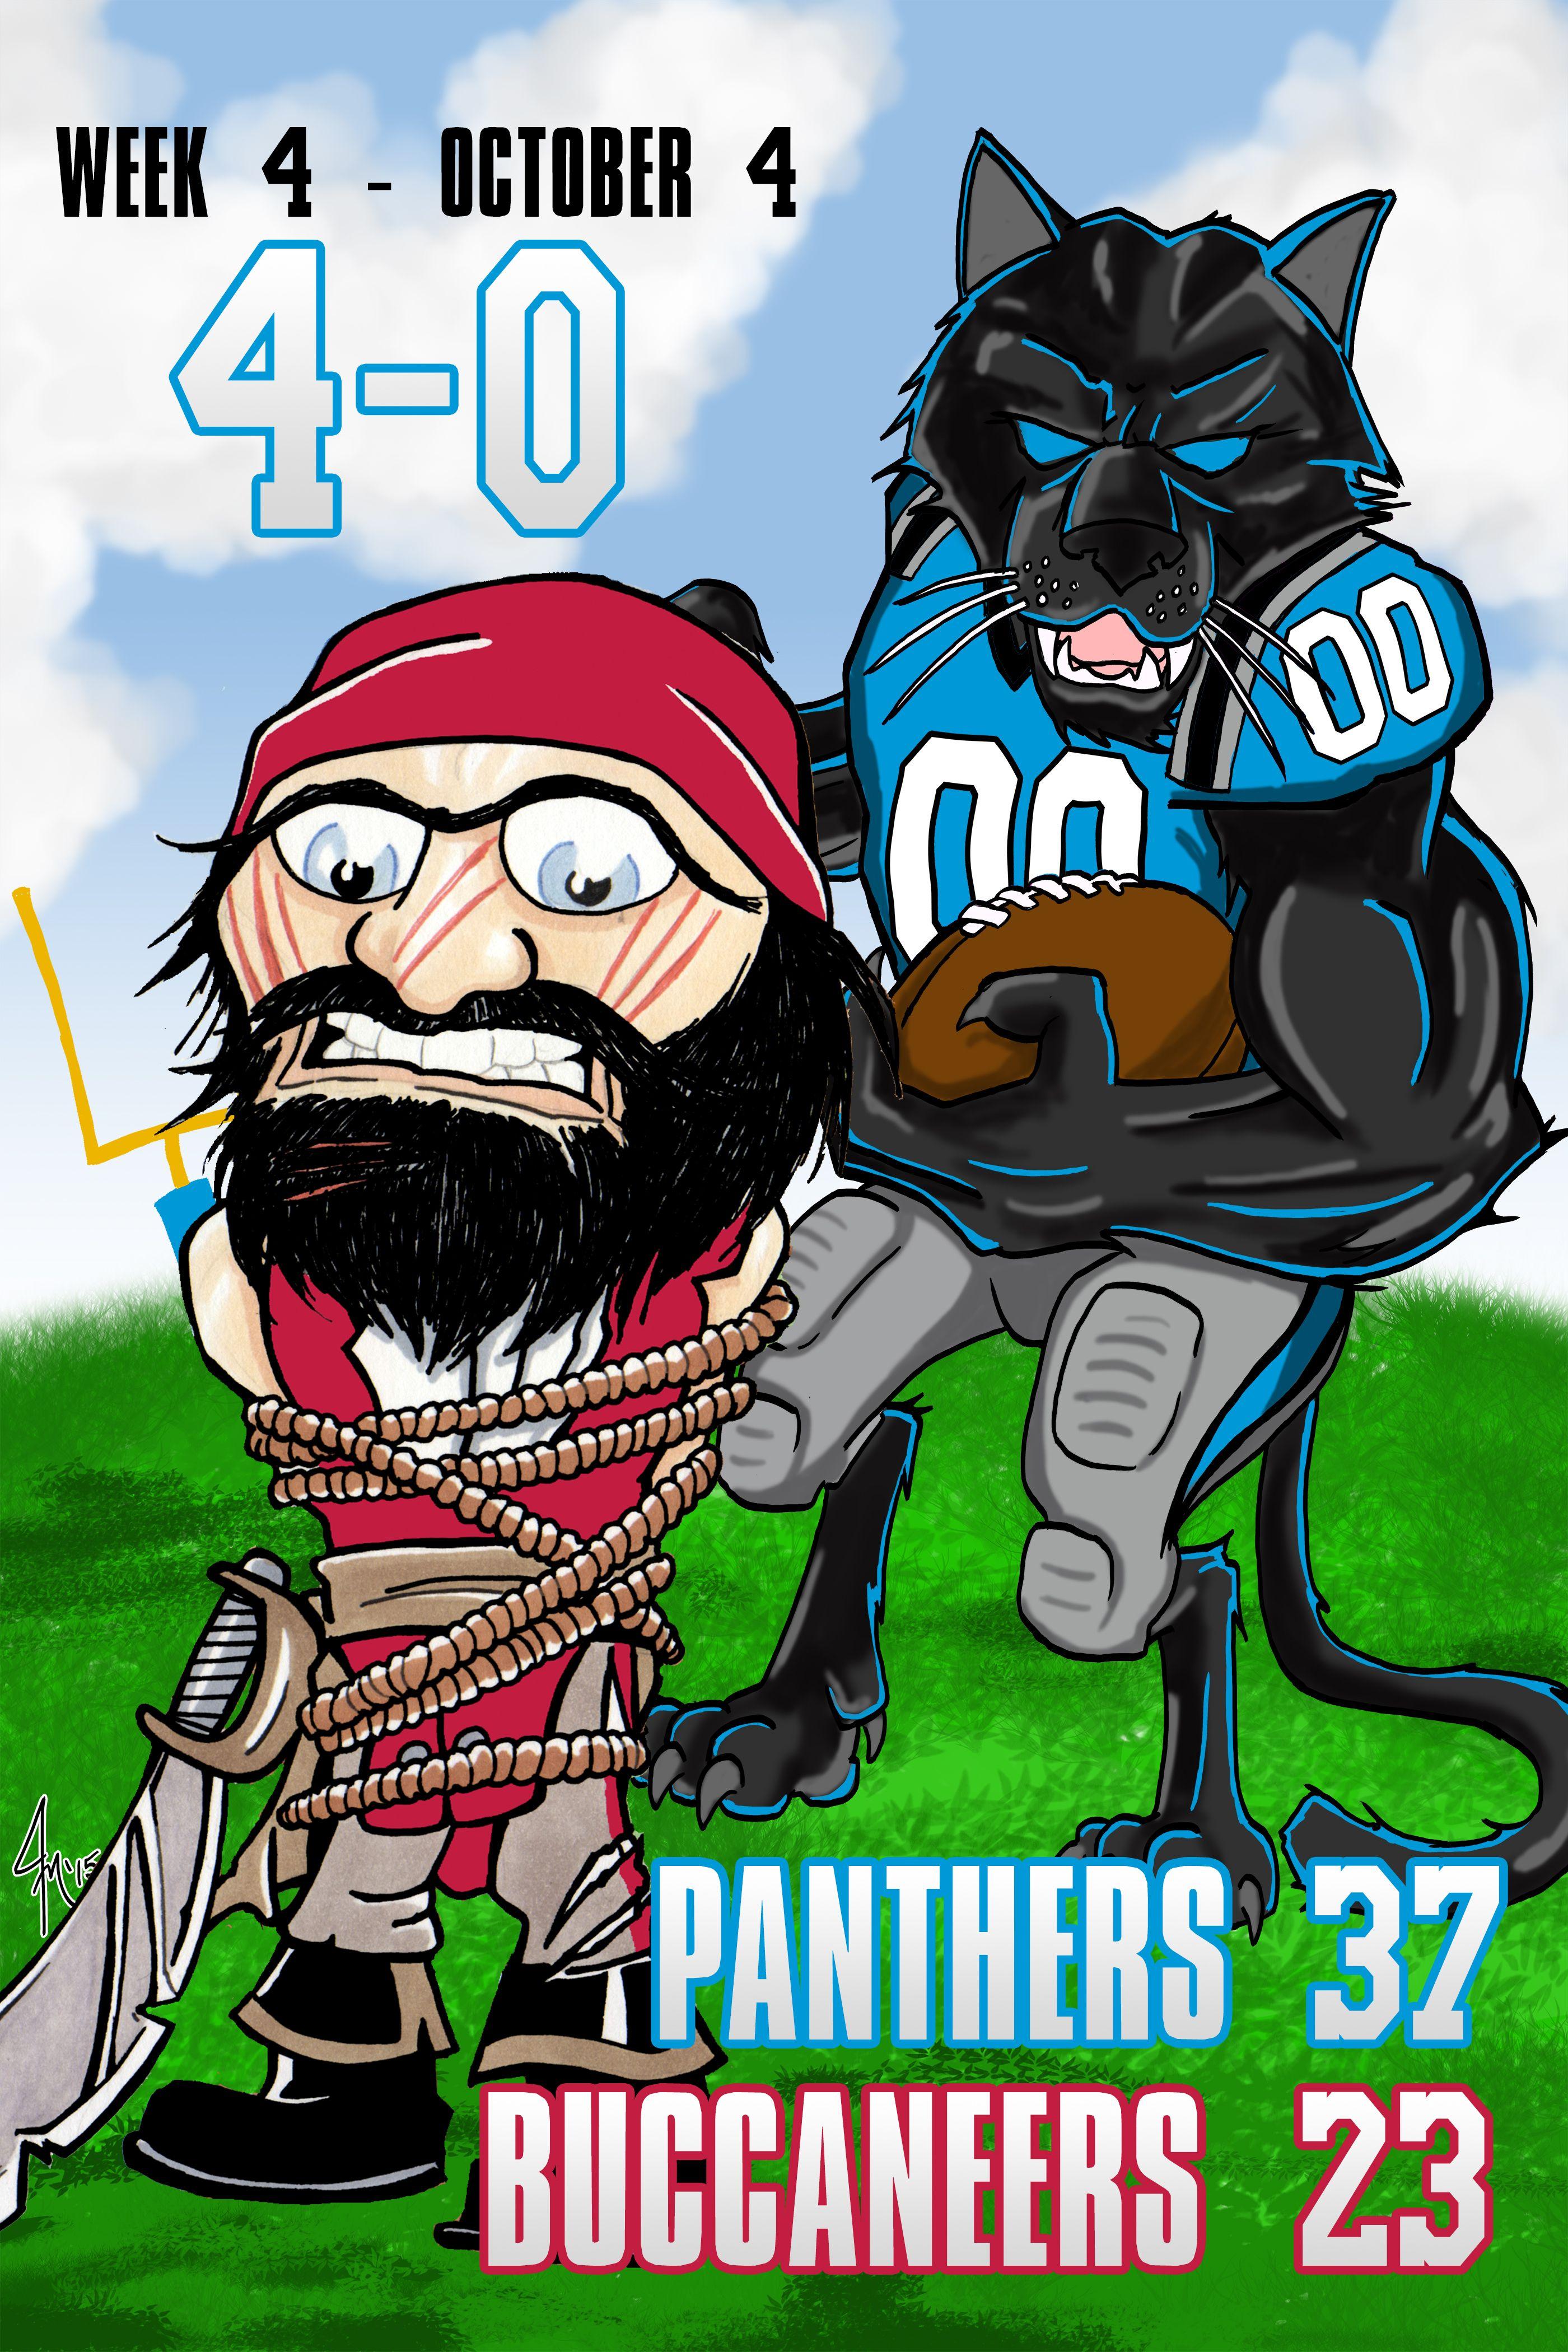 Man Cave Vs Study Meme : Carolina panther defeat tampa bay buccaneers the moving